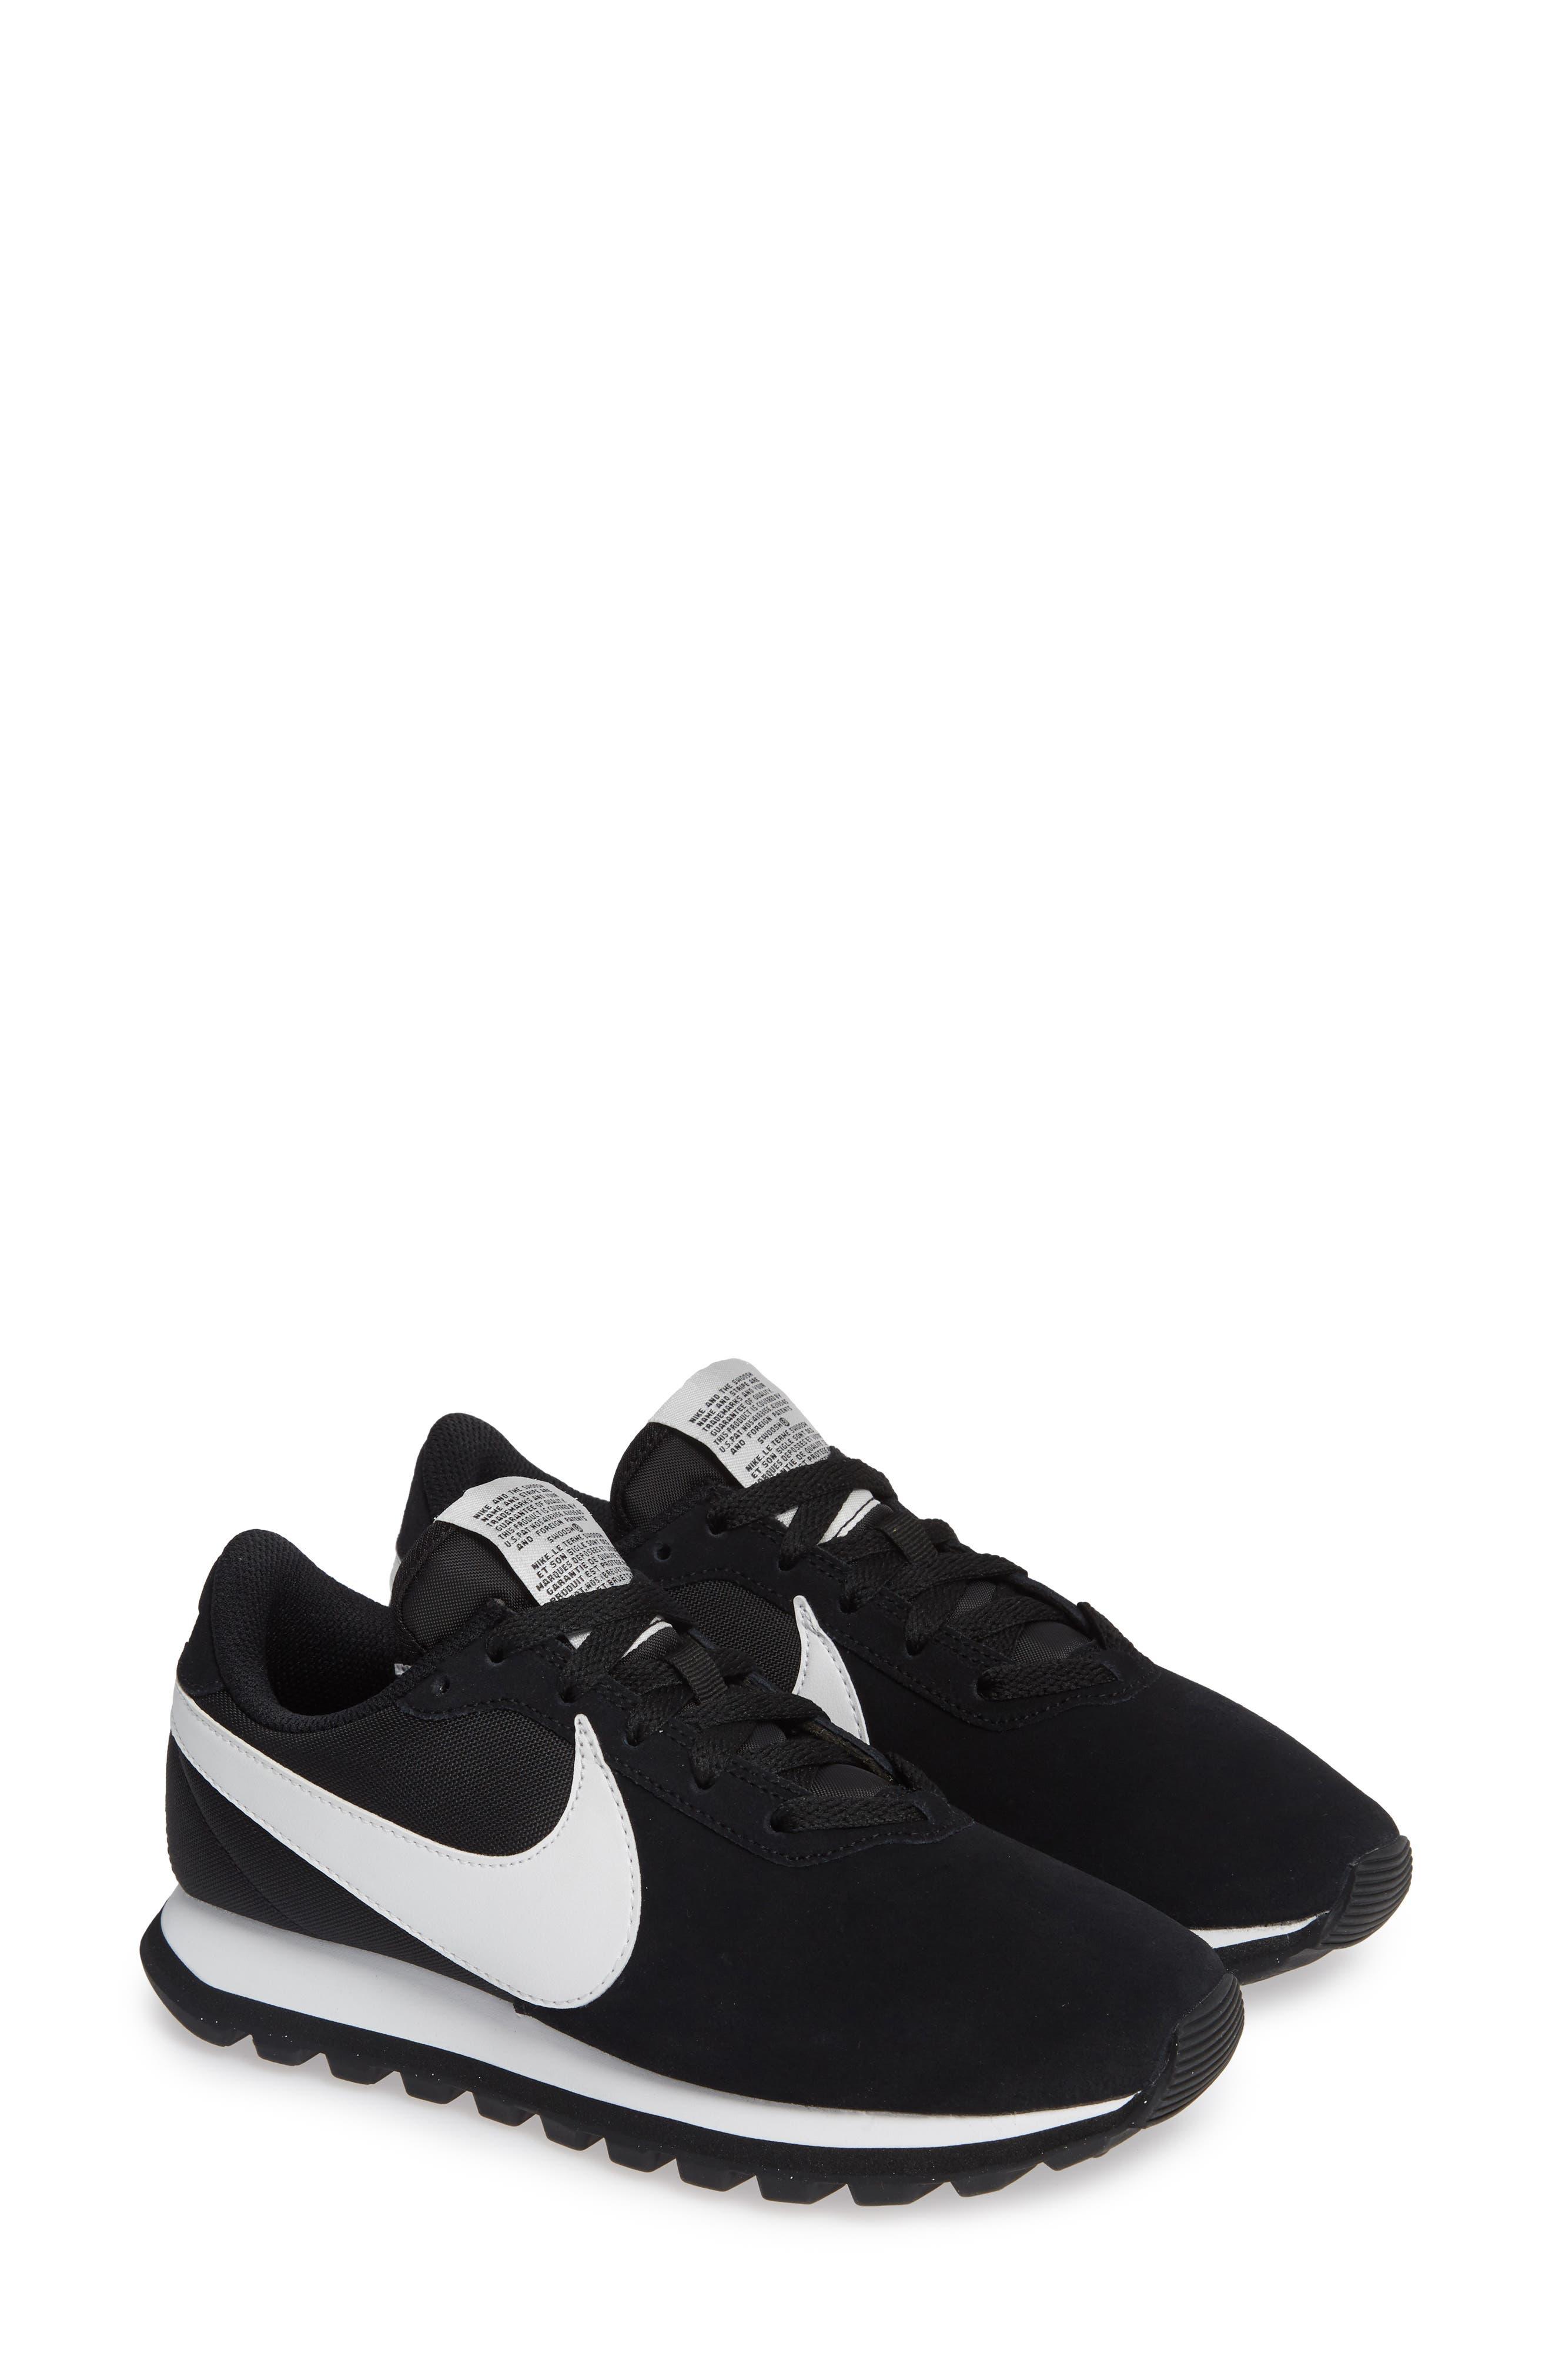 NIKE, Pre Love O.X. Sneaker, Alternate thumbnail 2, color, BLACK/ SUMMIT WHITE